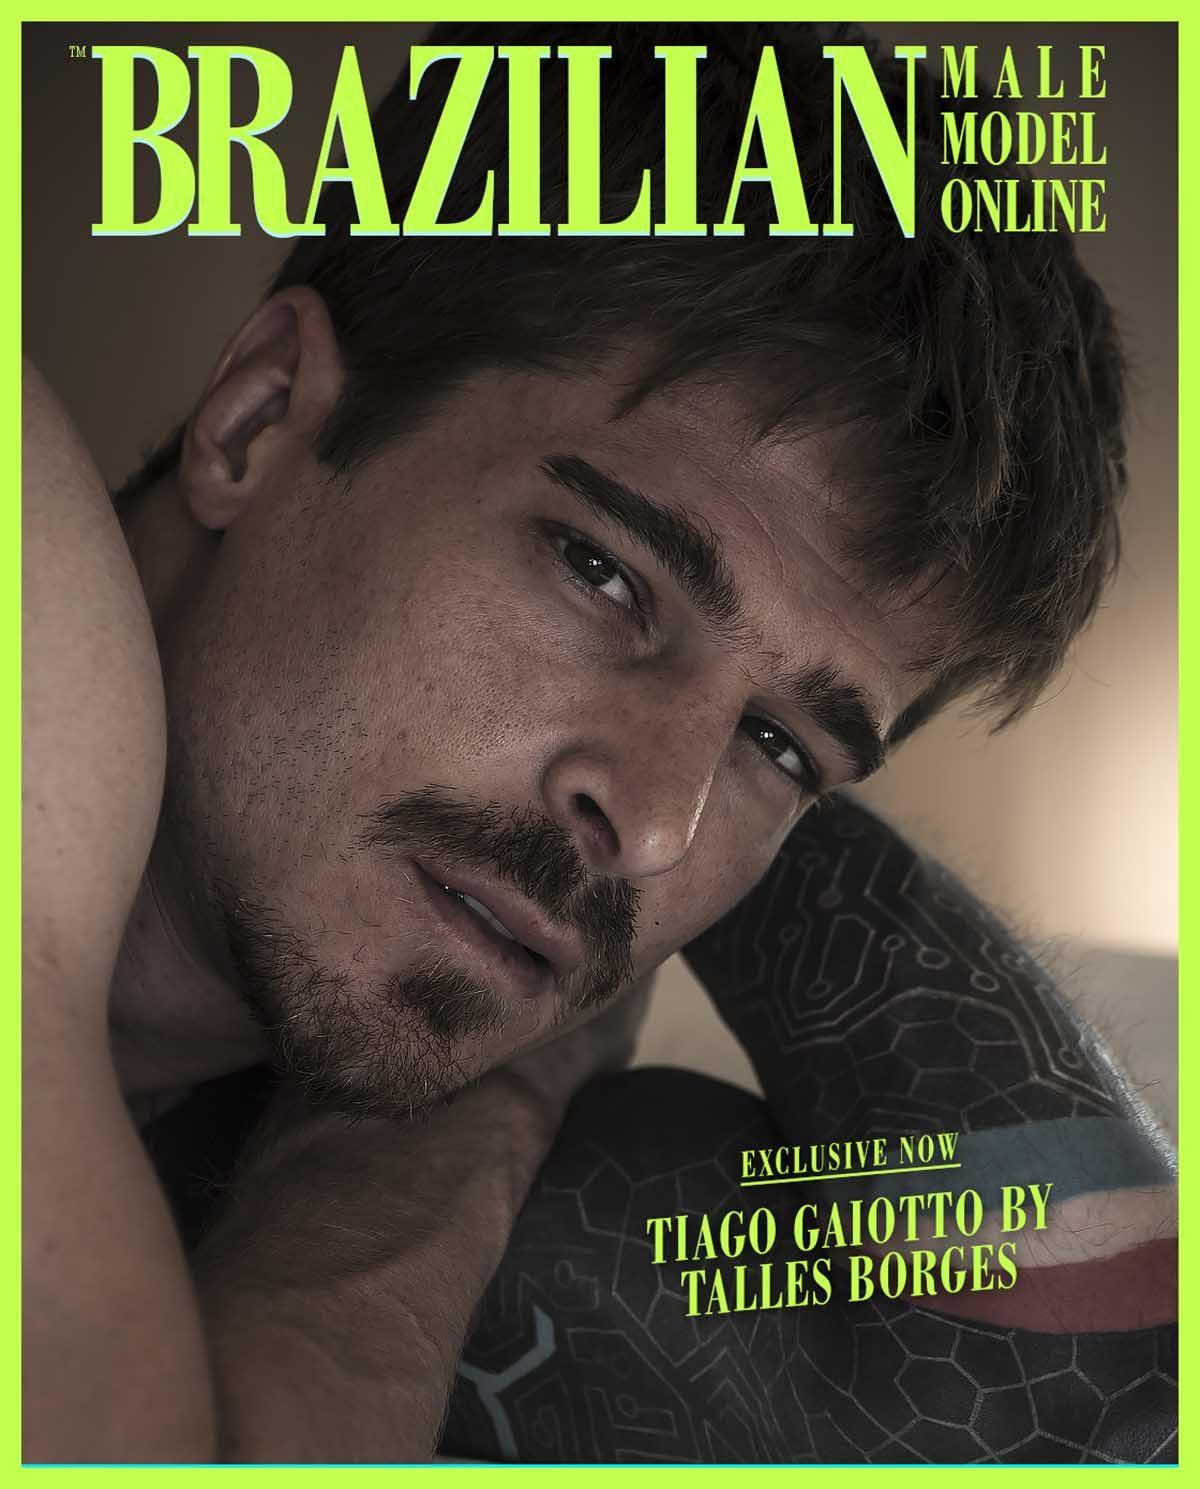 Tiago Gaiotto by Talles Borges